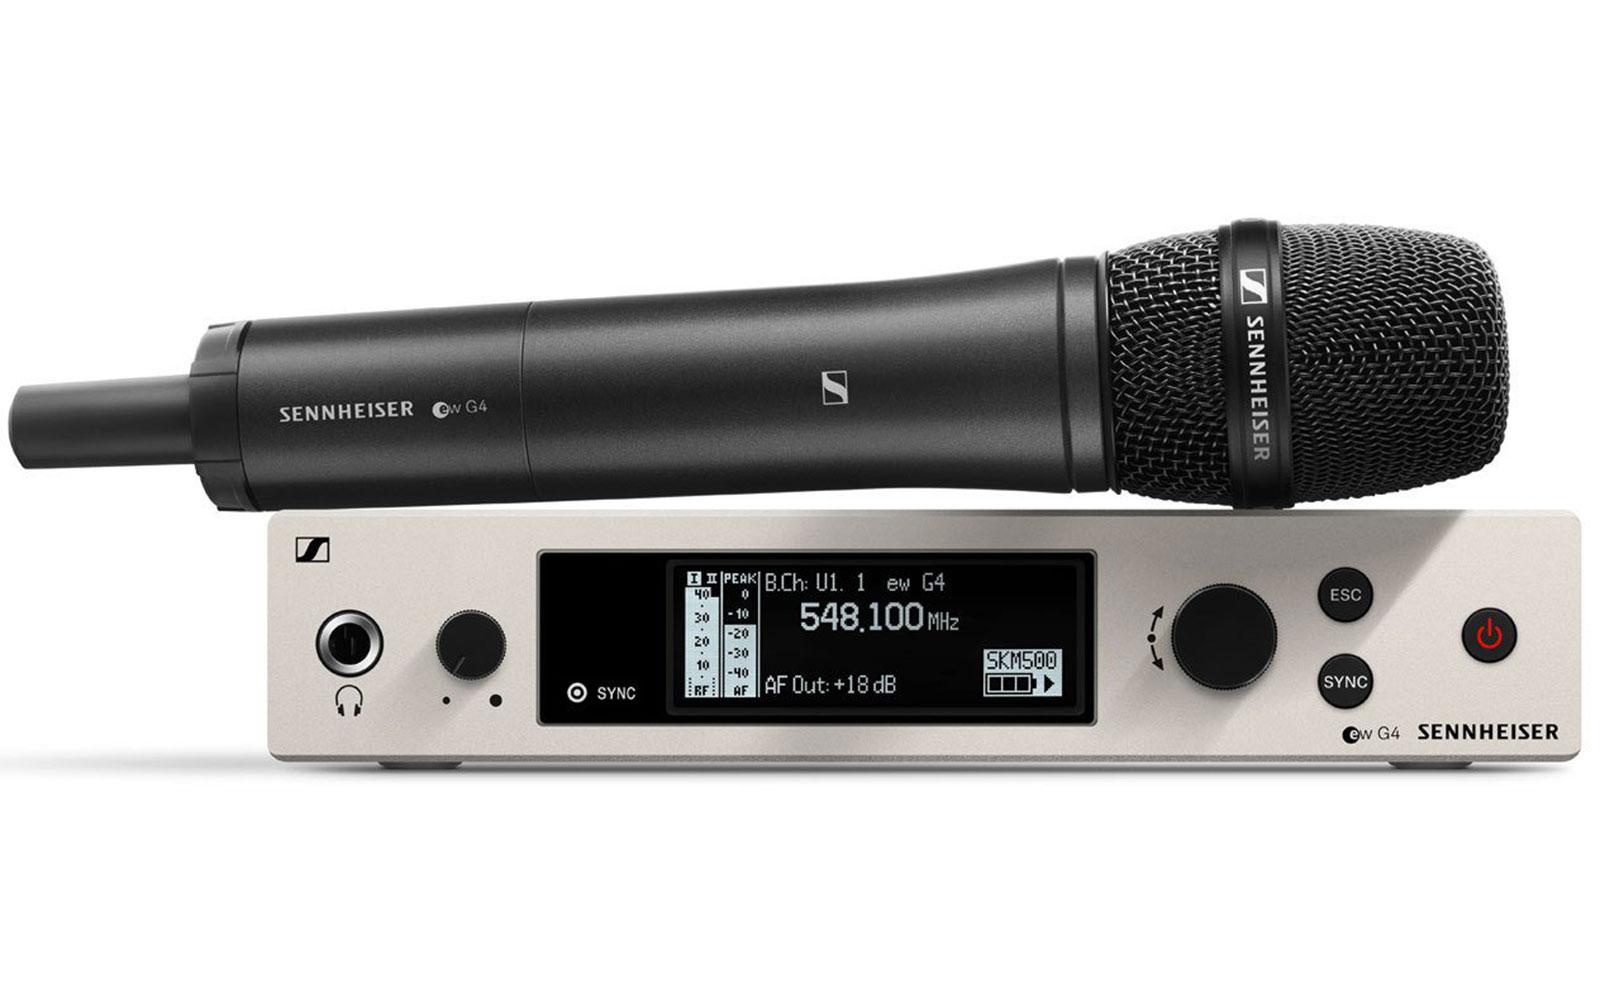 sennheiser-ew-500-g4-935-aw-frequenz-470-558-mhz-